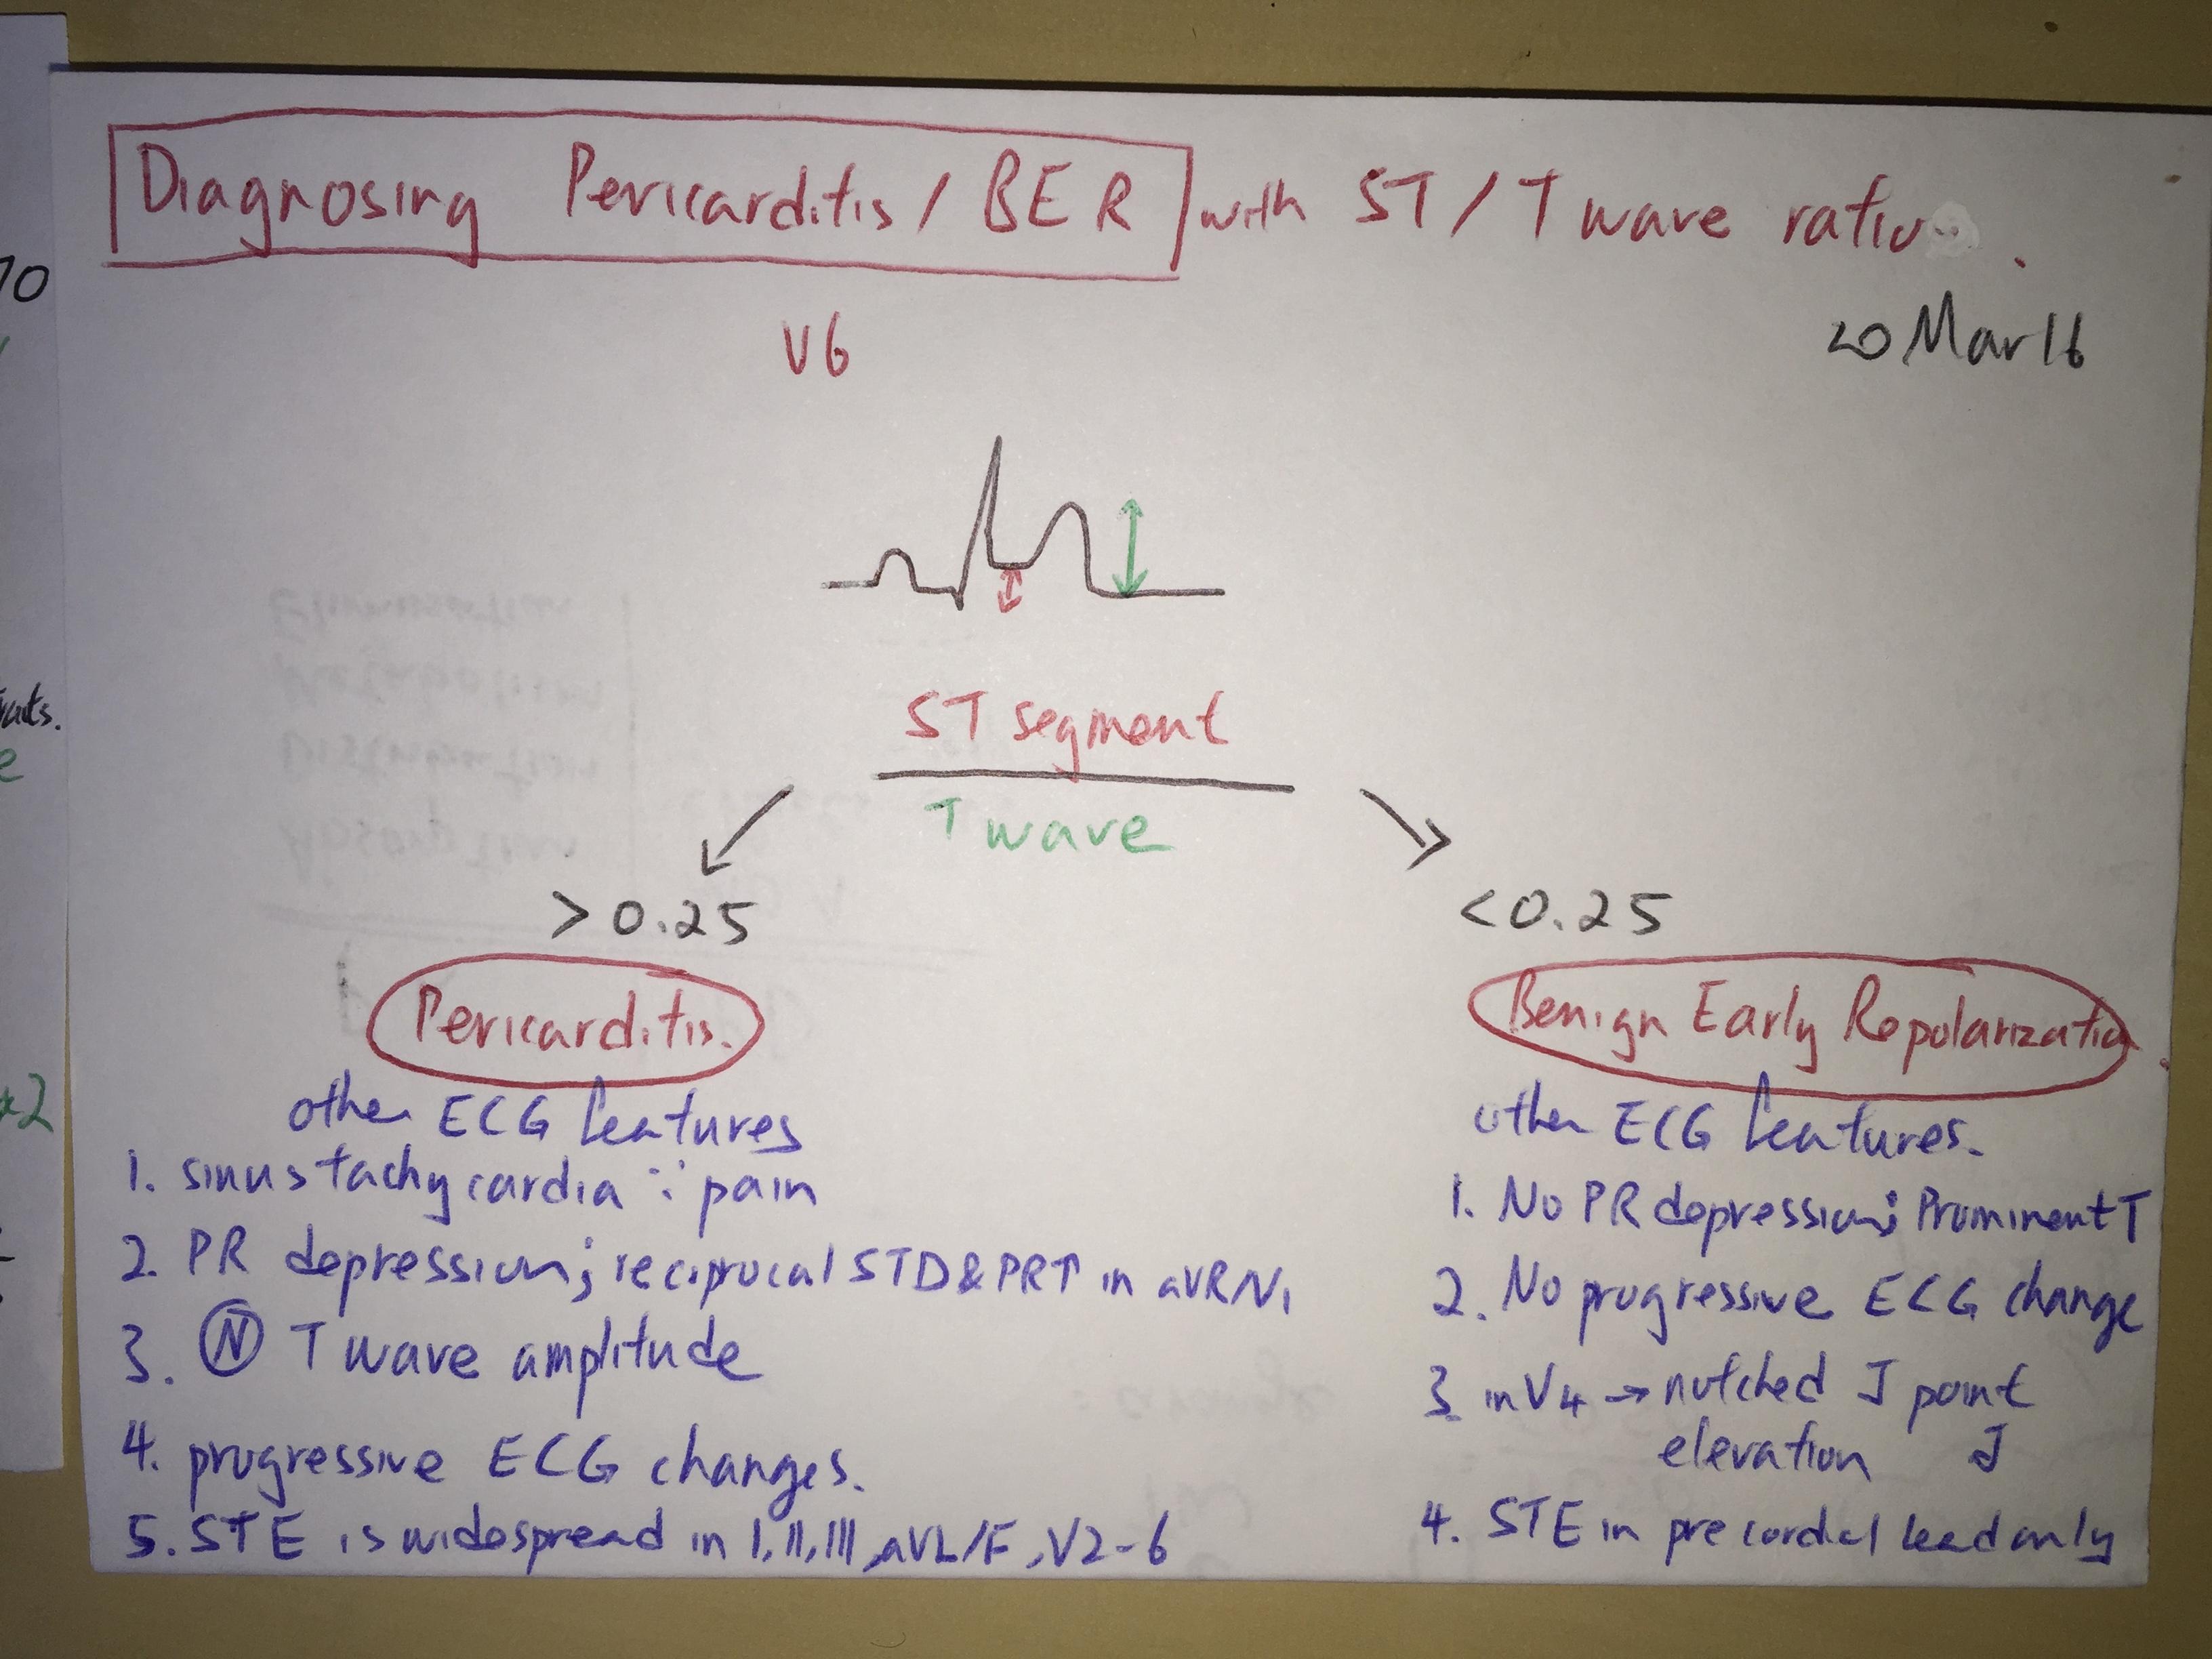 ECG pericarditis vs benign early repolarization